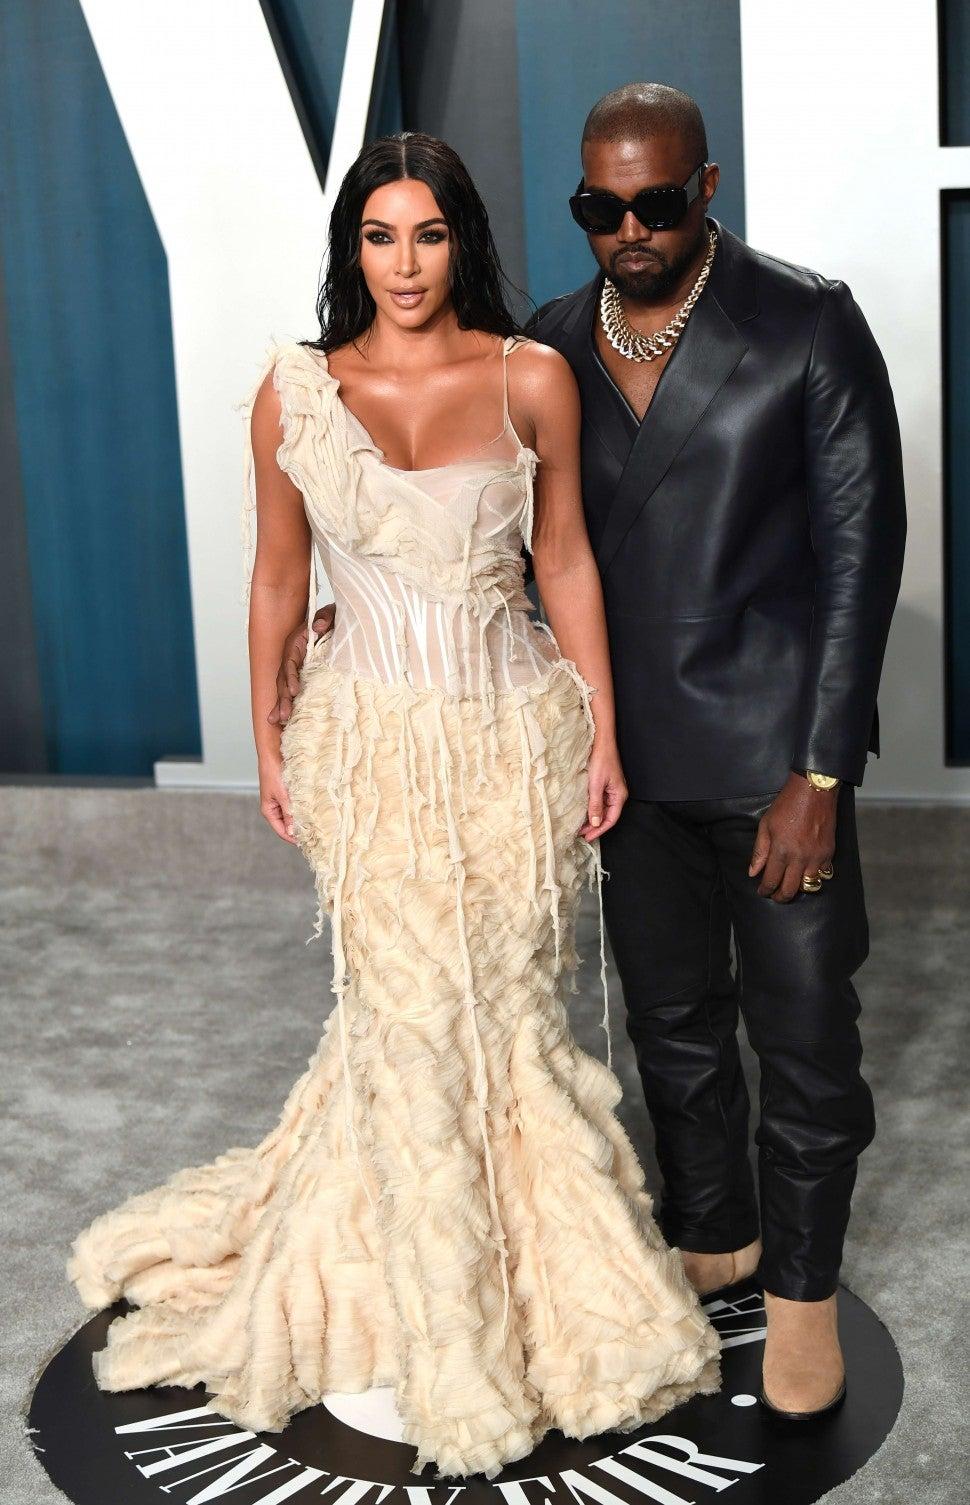 Kim Kardashian and Kanye West at the Vanity Fair Oscars Party 2020